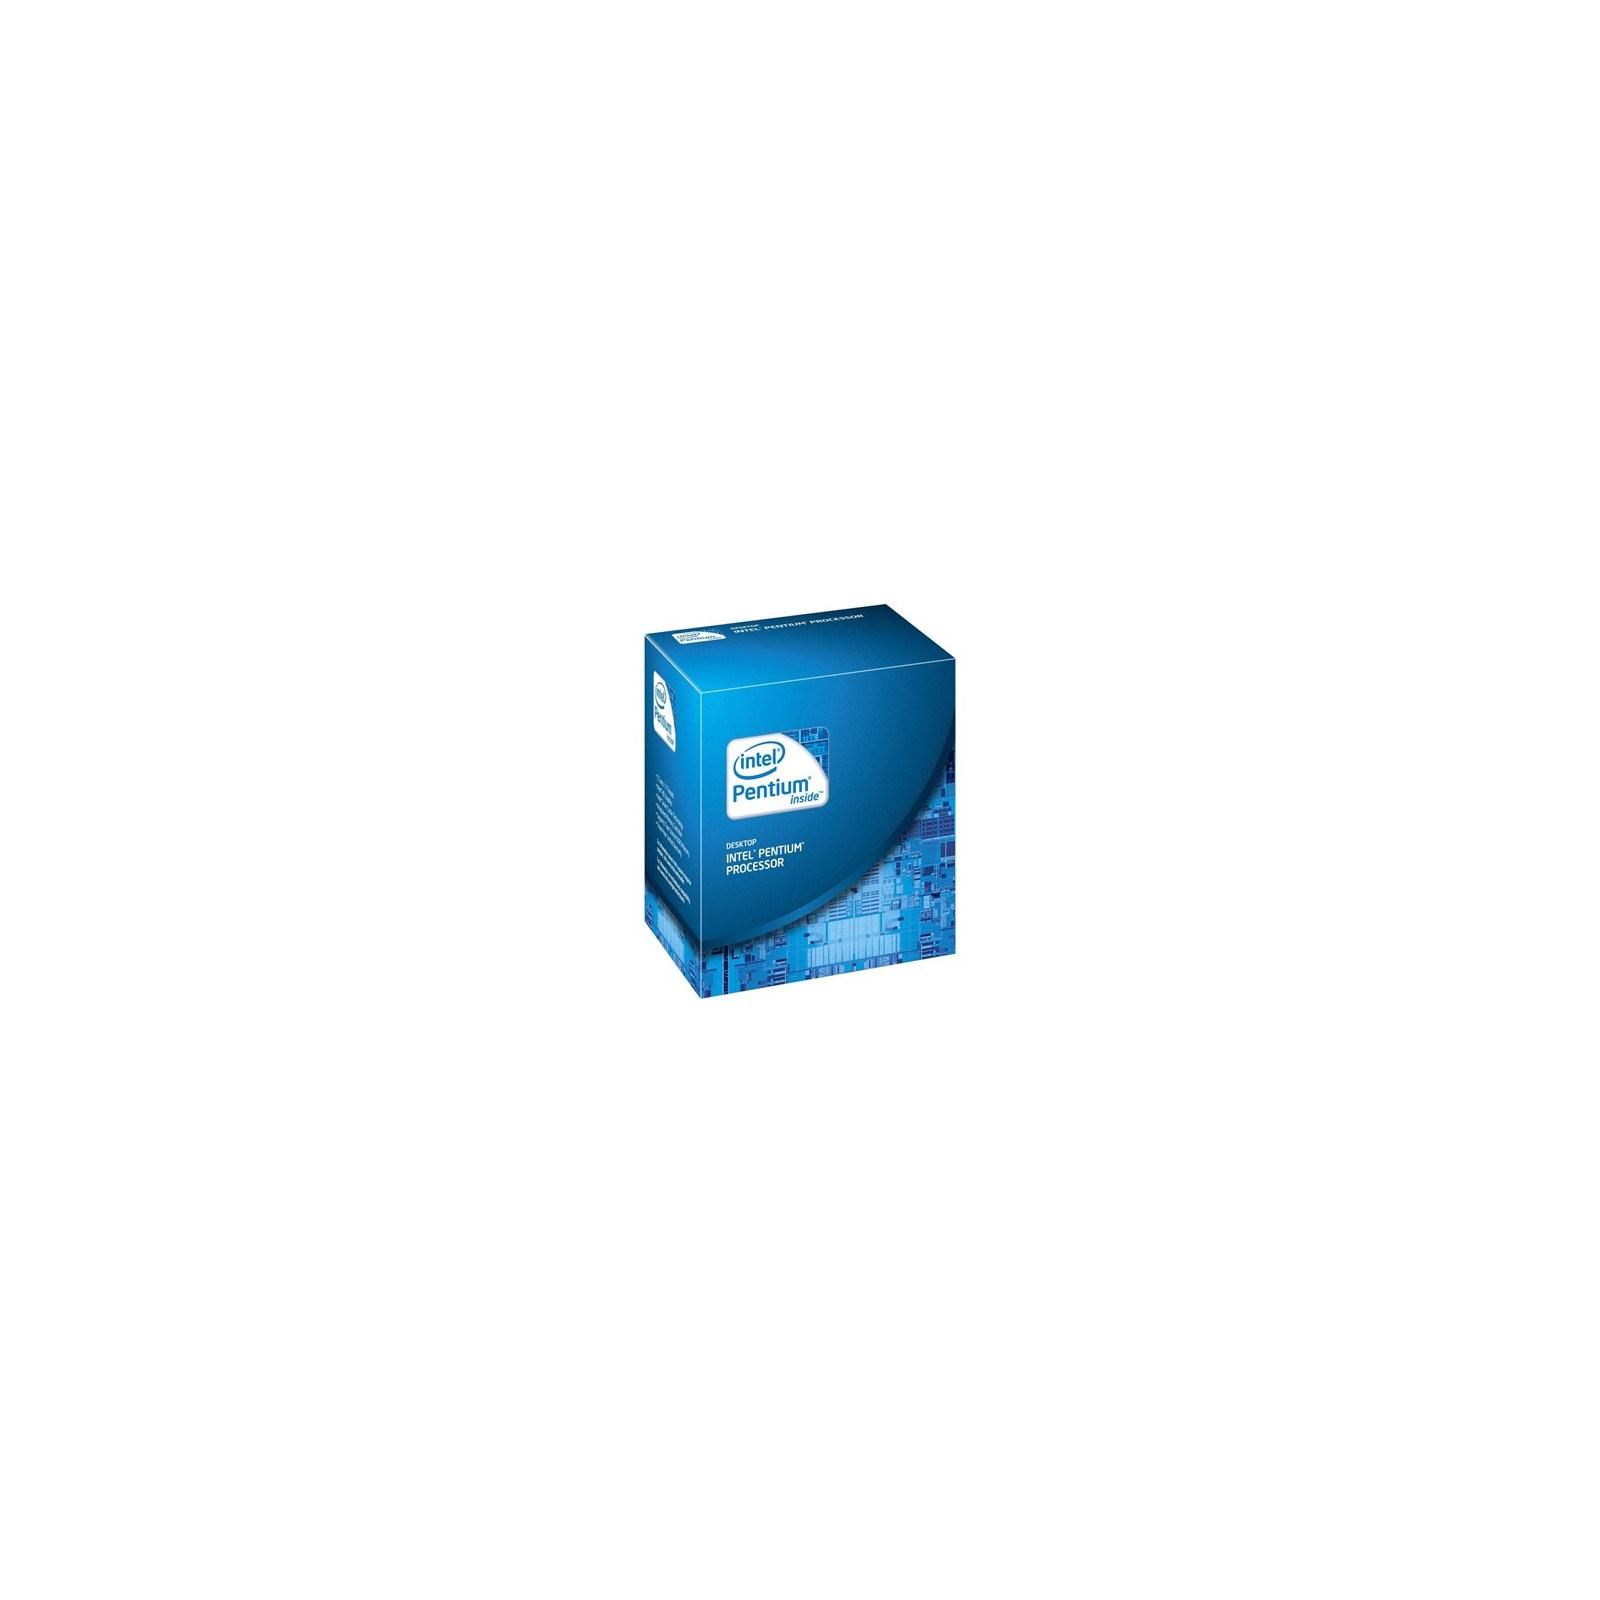 Процессор INTEL Pentium G2130 (BX80637G2130)